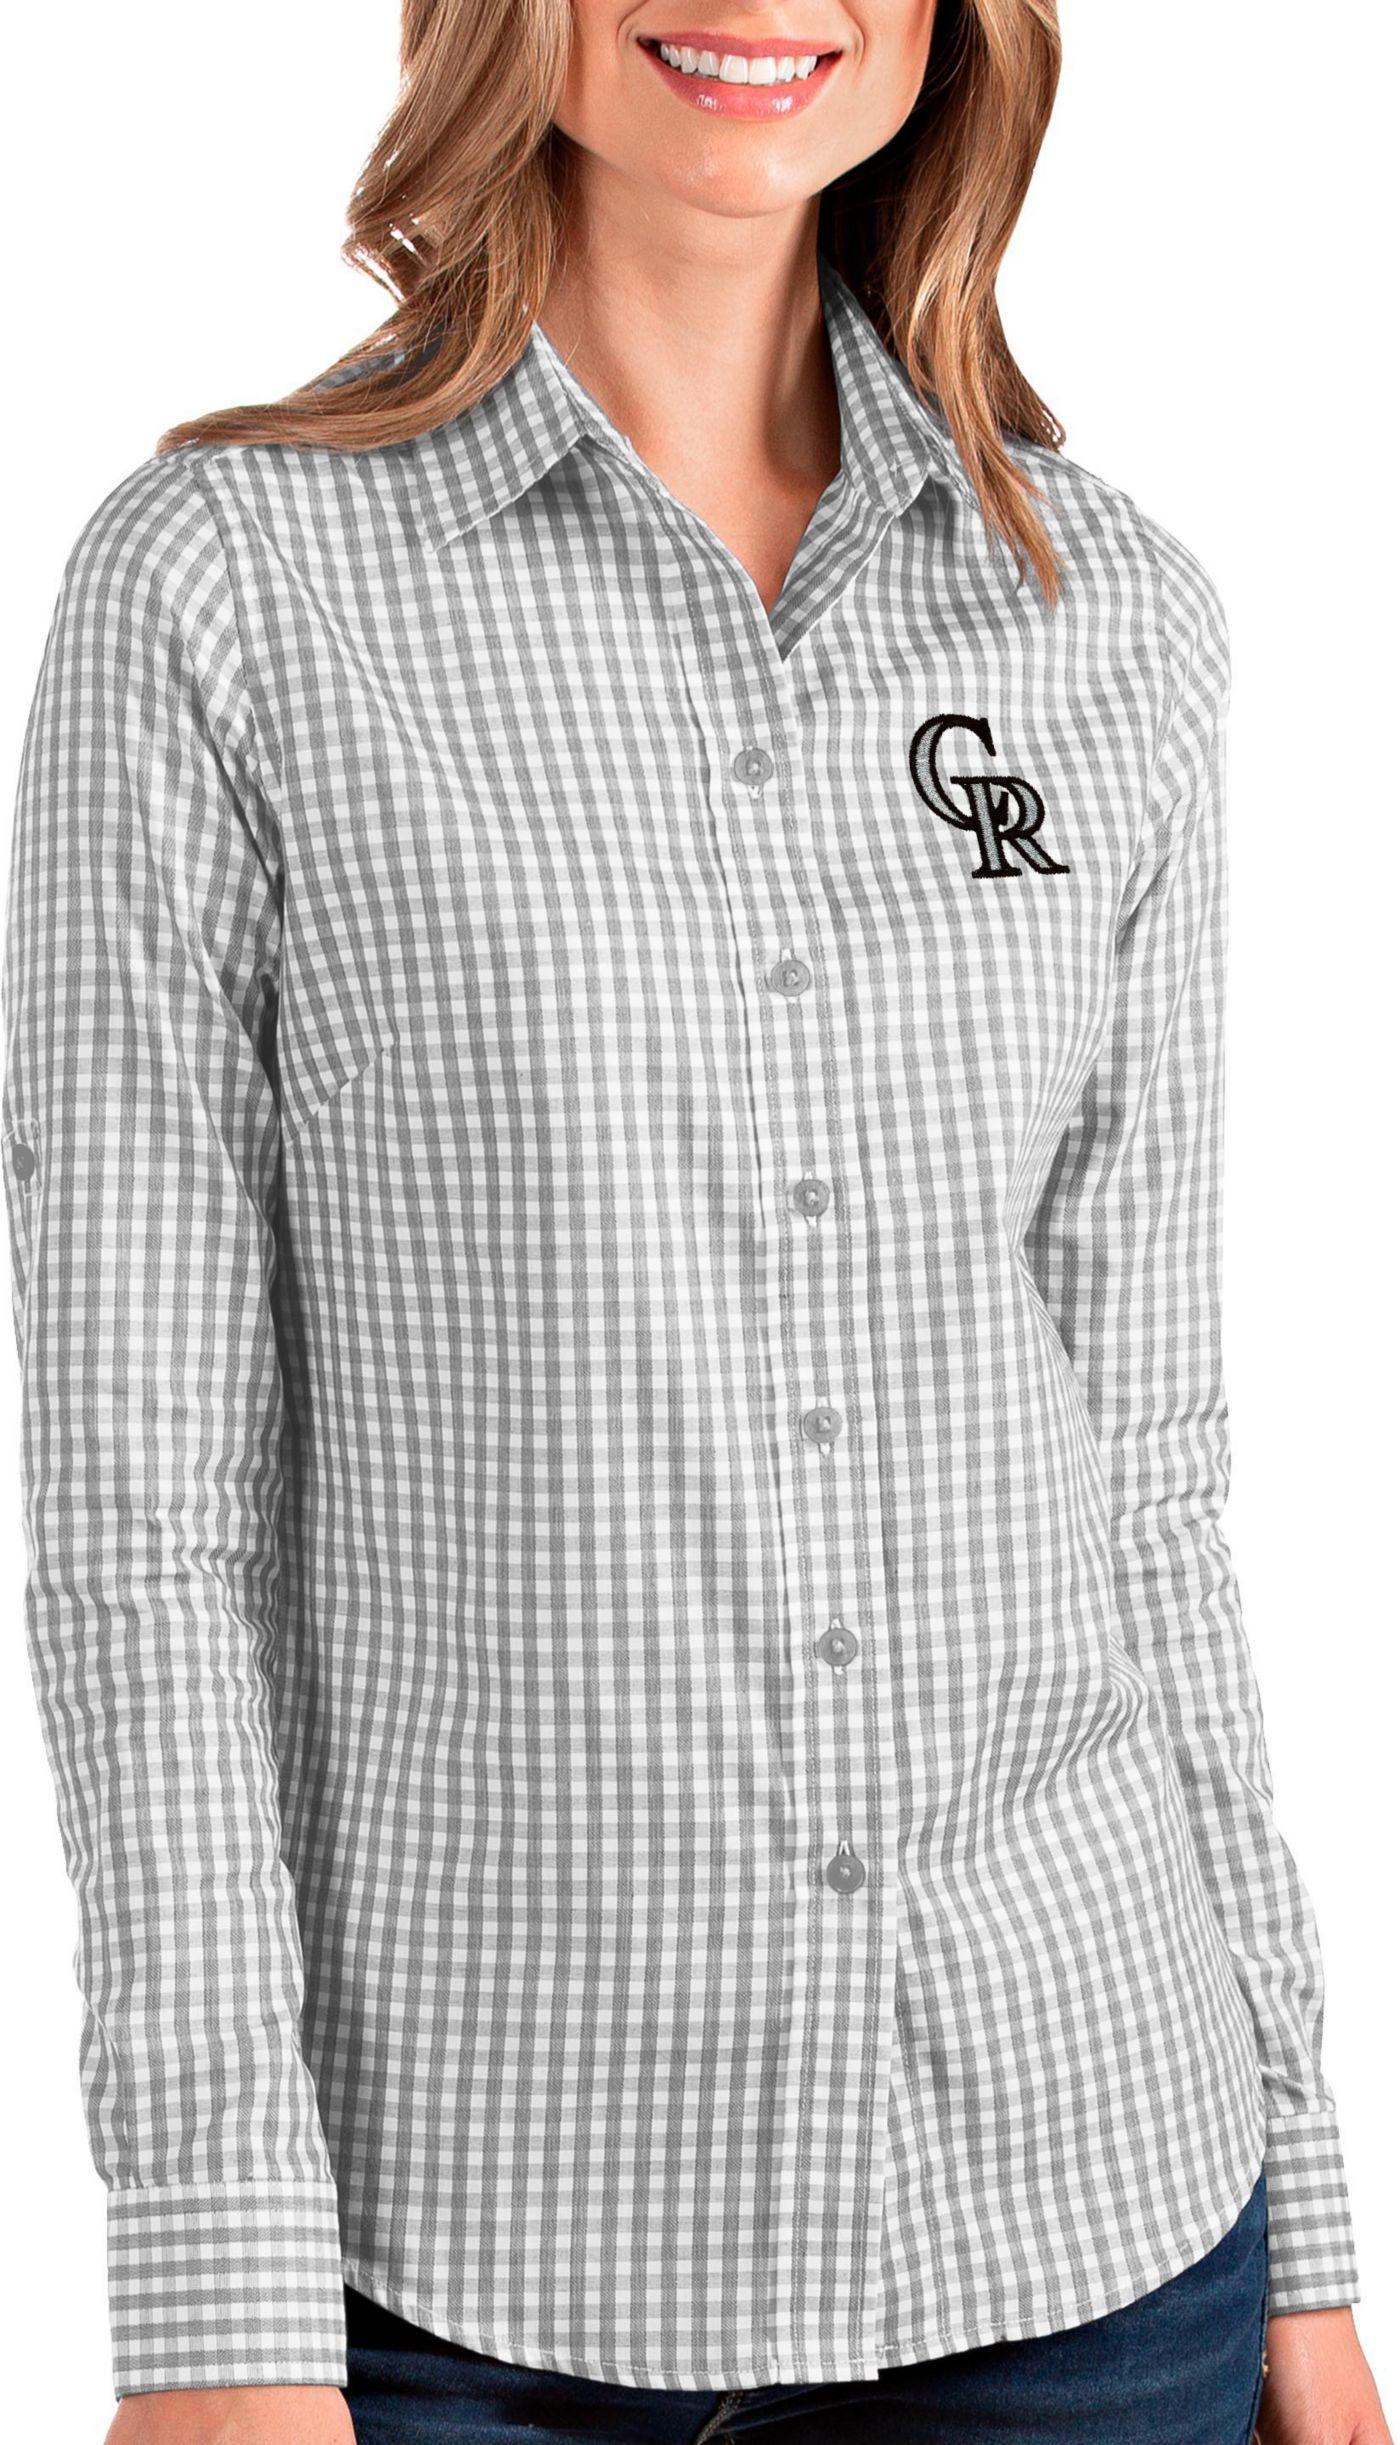 Antigua Women's Colorado Rockies Structure Button-Up Grey Long Sleeve Shirt